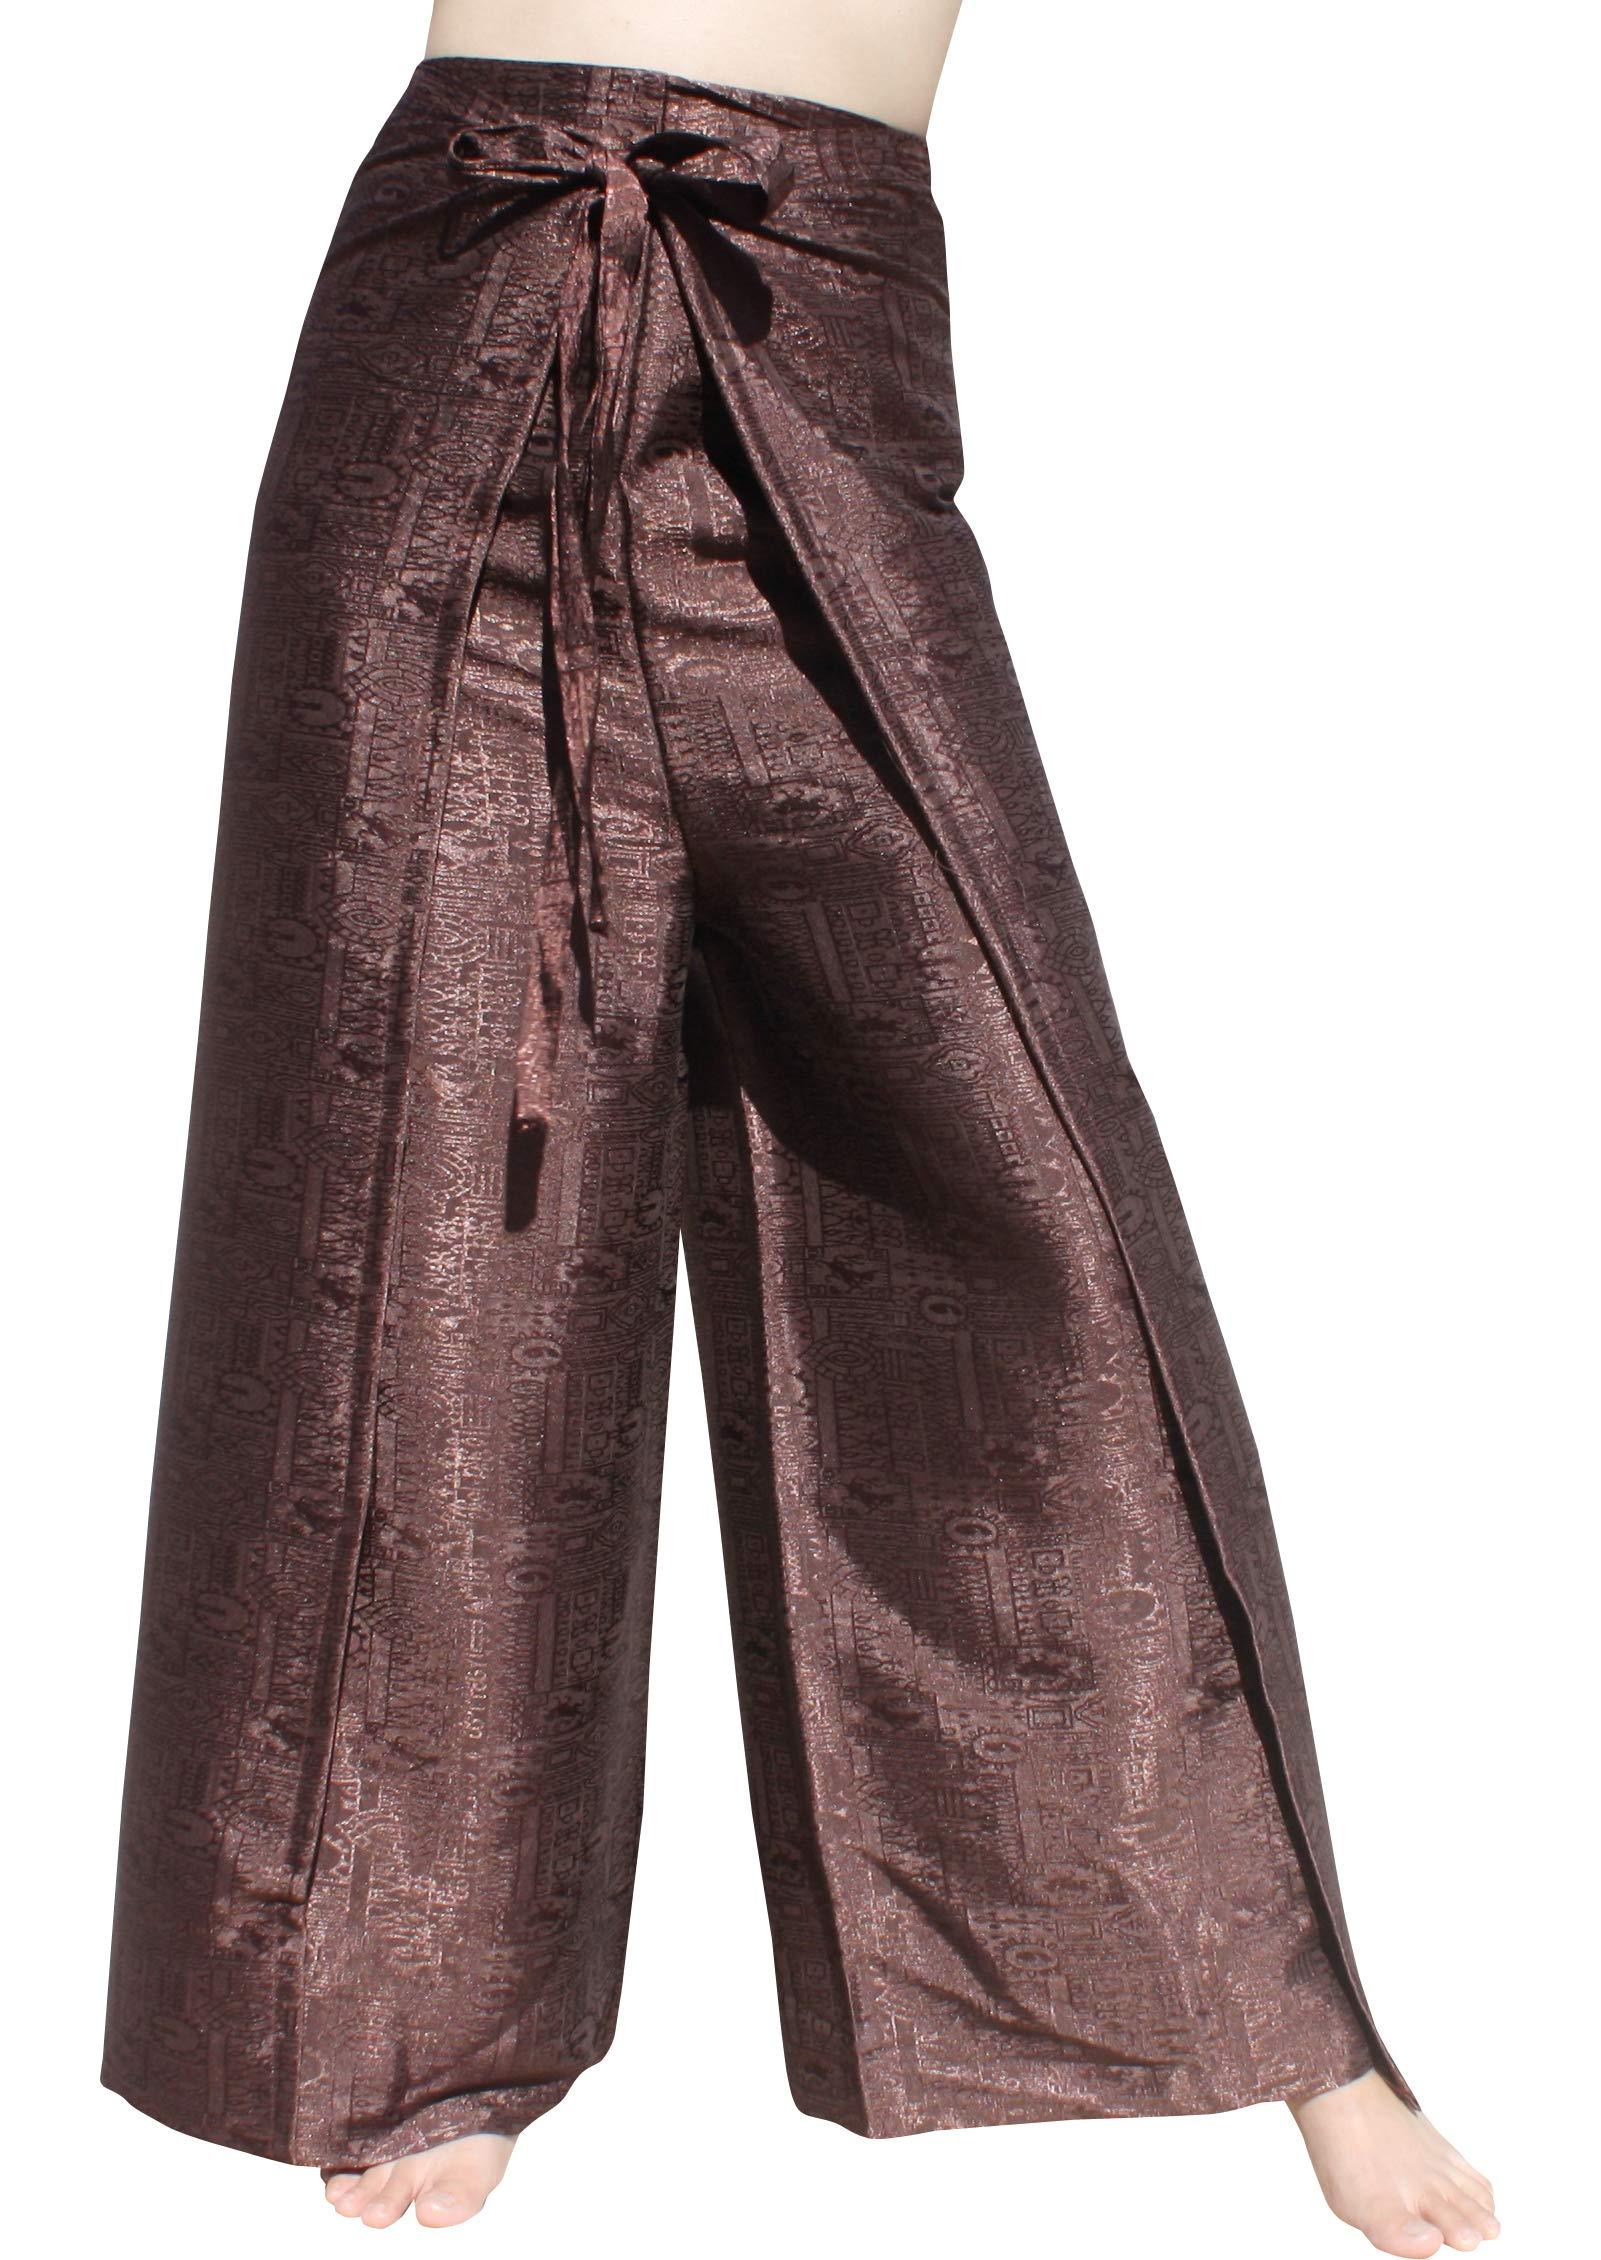 RaanPahMuang Brand Geometric Thick Textured Silk Drive in Wrap Pants, XX-Large, Black Brown by RaanPahMuang